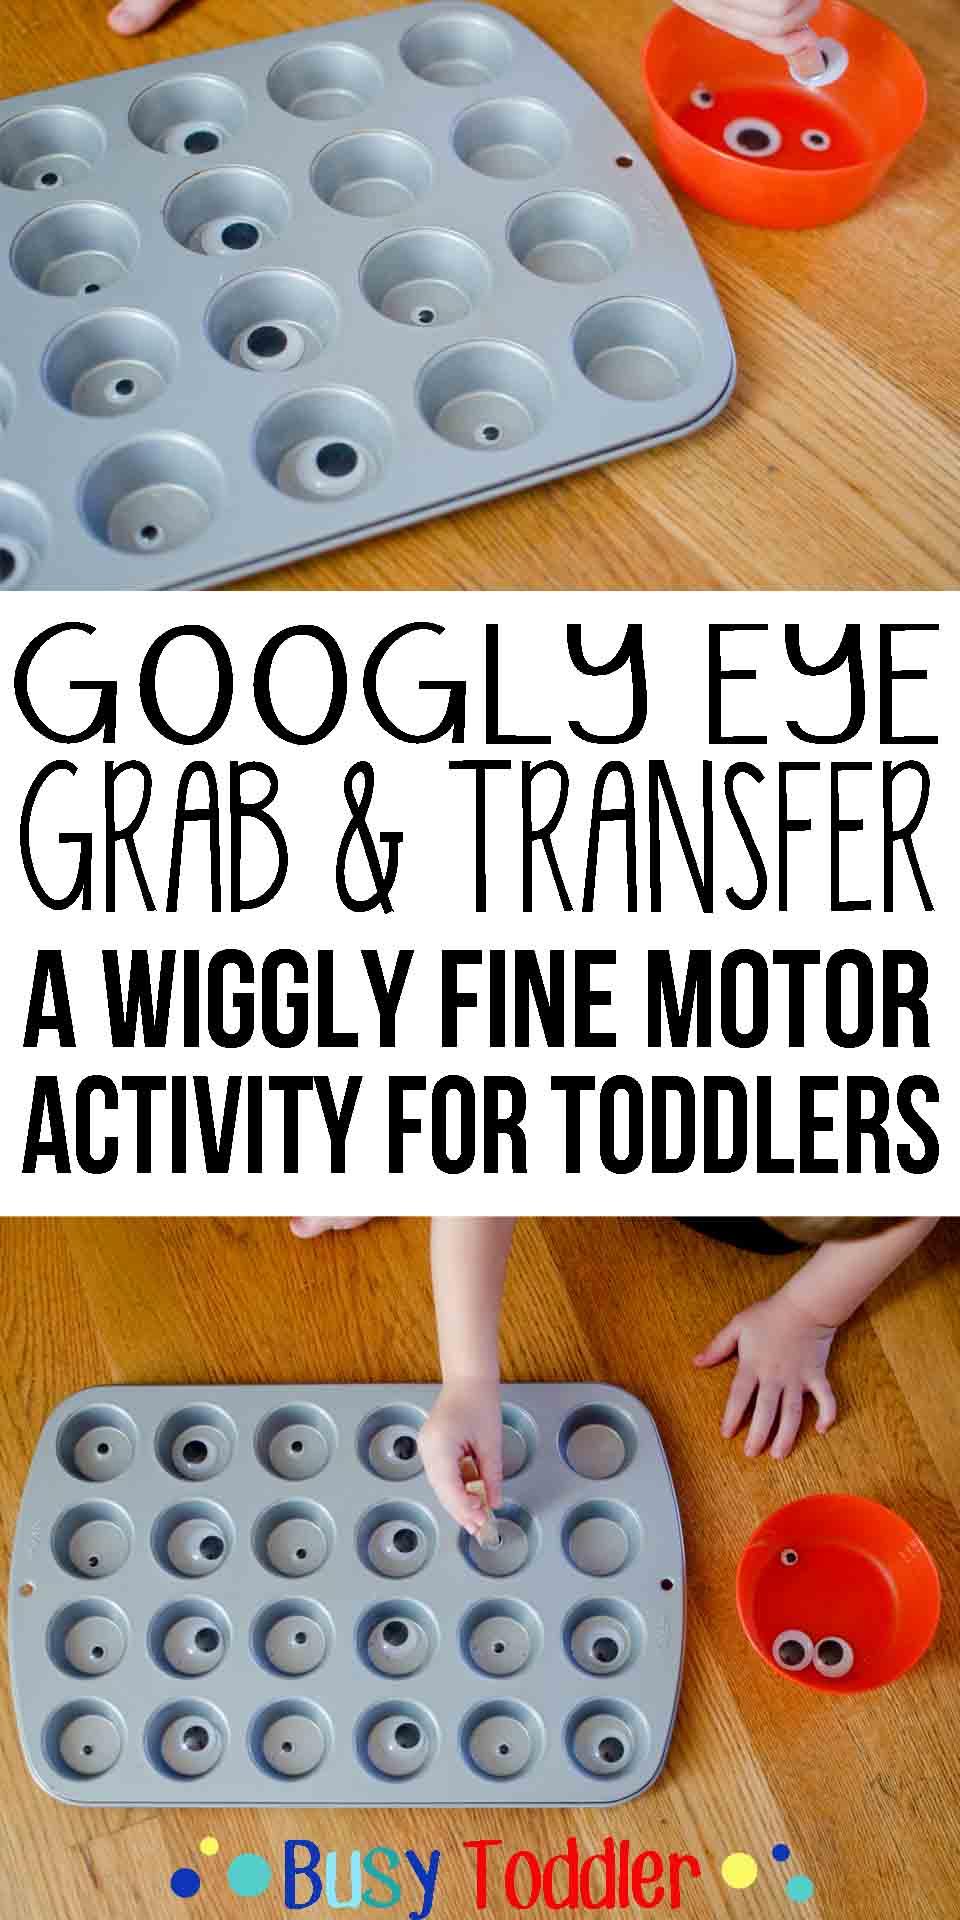 Googly Eye Grab: a wiggly fine motor skills activity